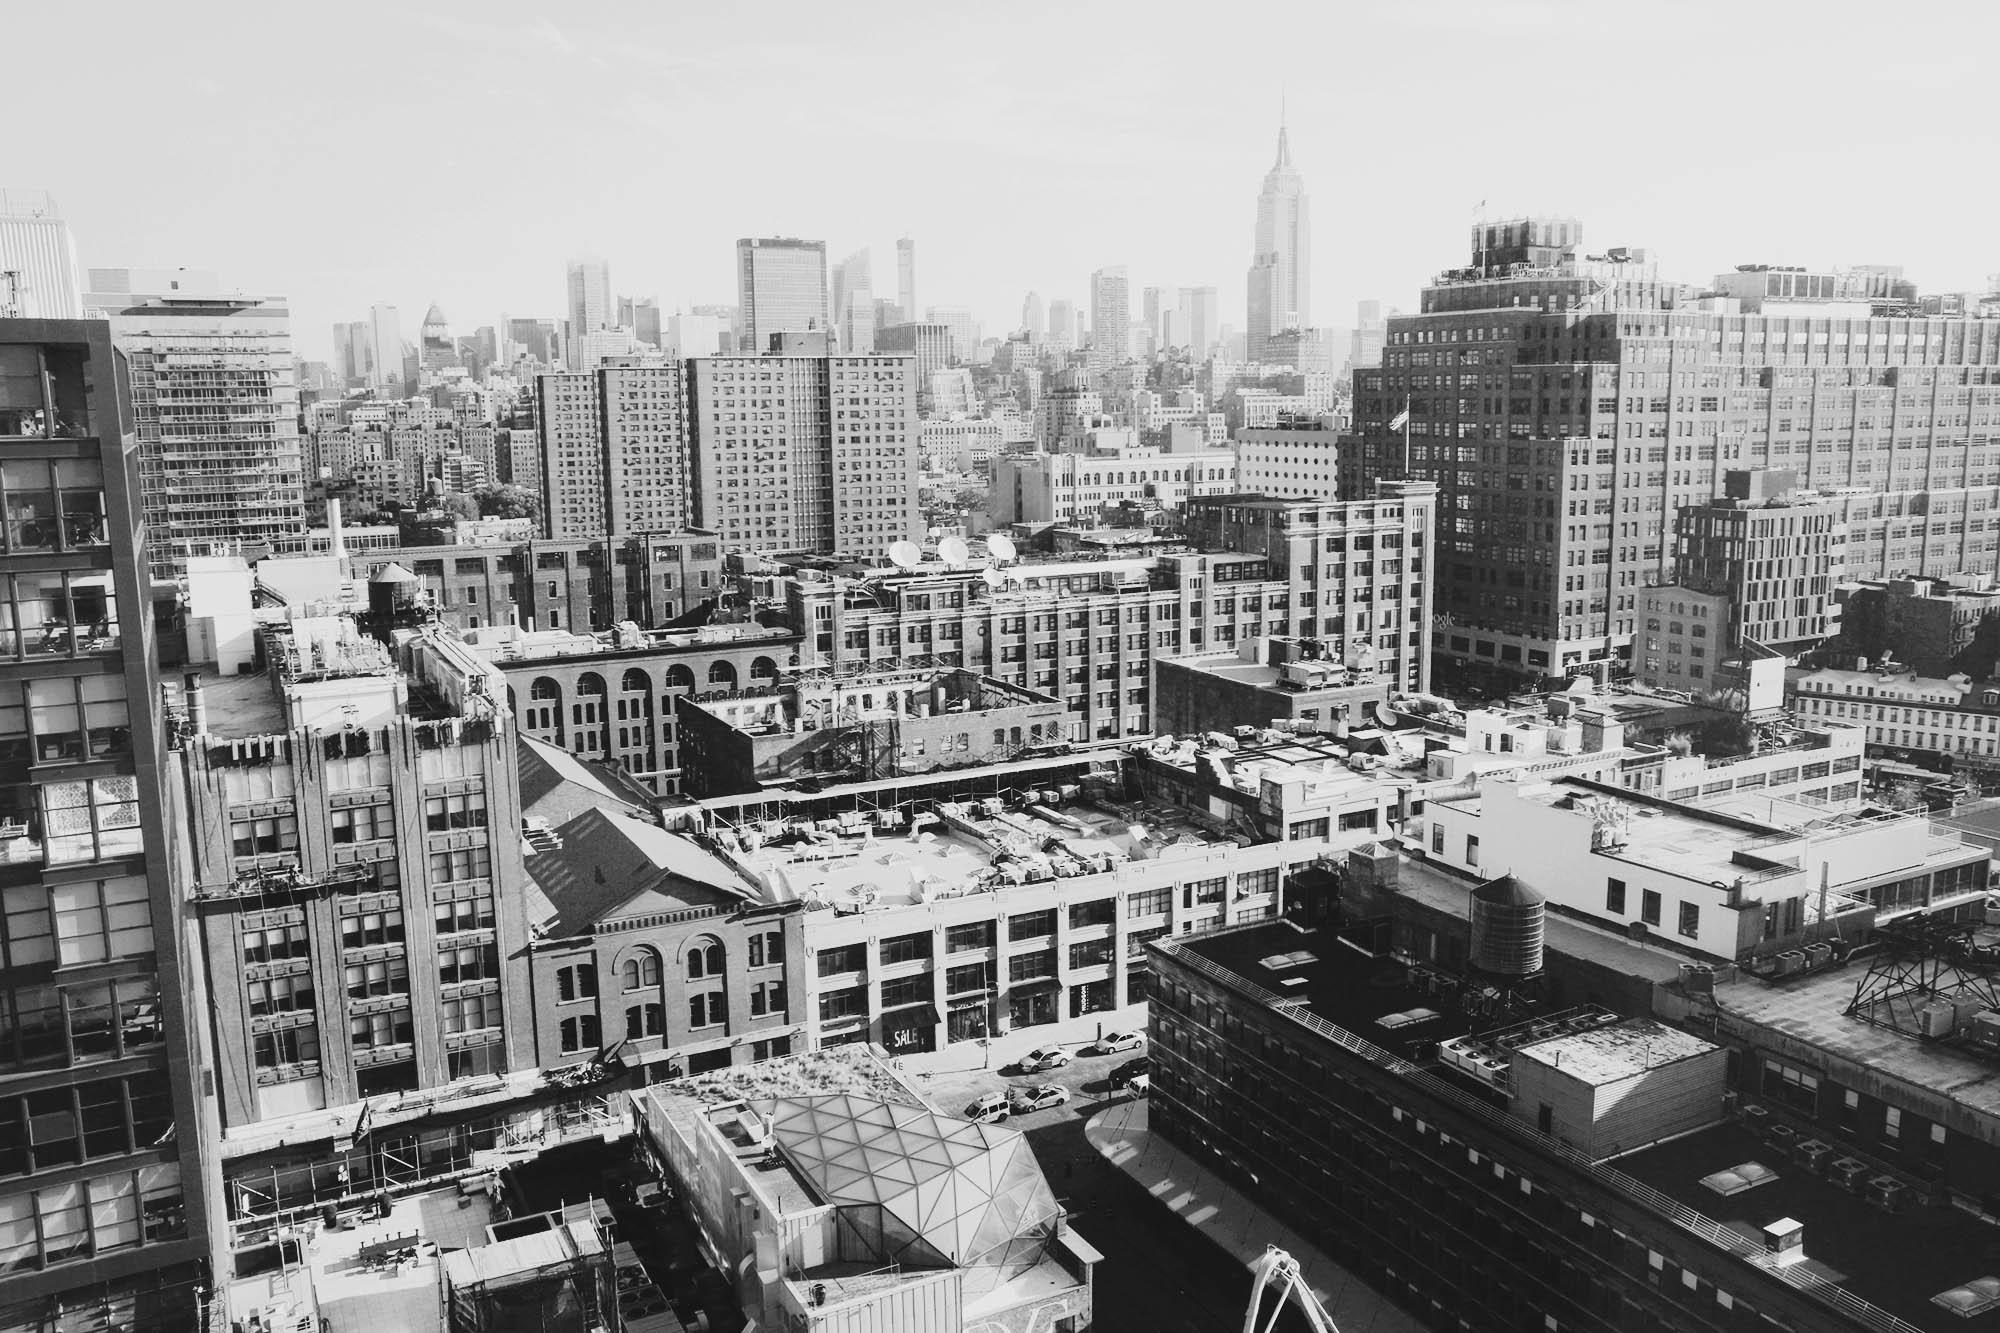 2017-04-The-Standard - the-standard-new-york-nectarandpulse-view-25.jpg